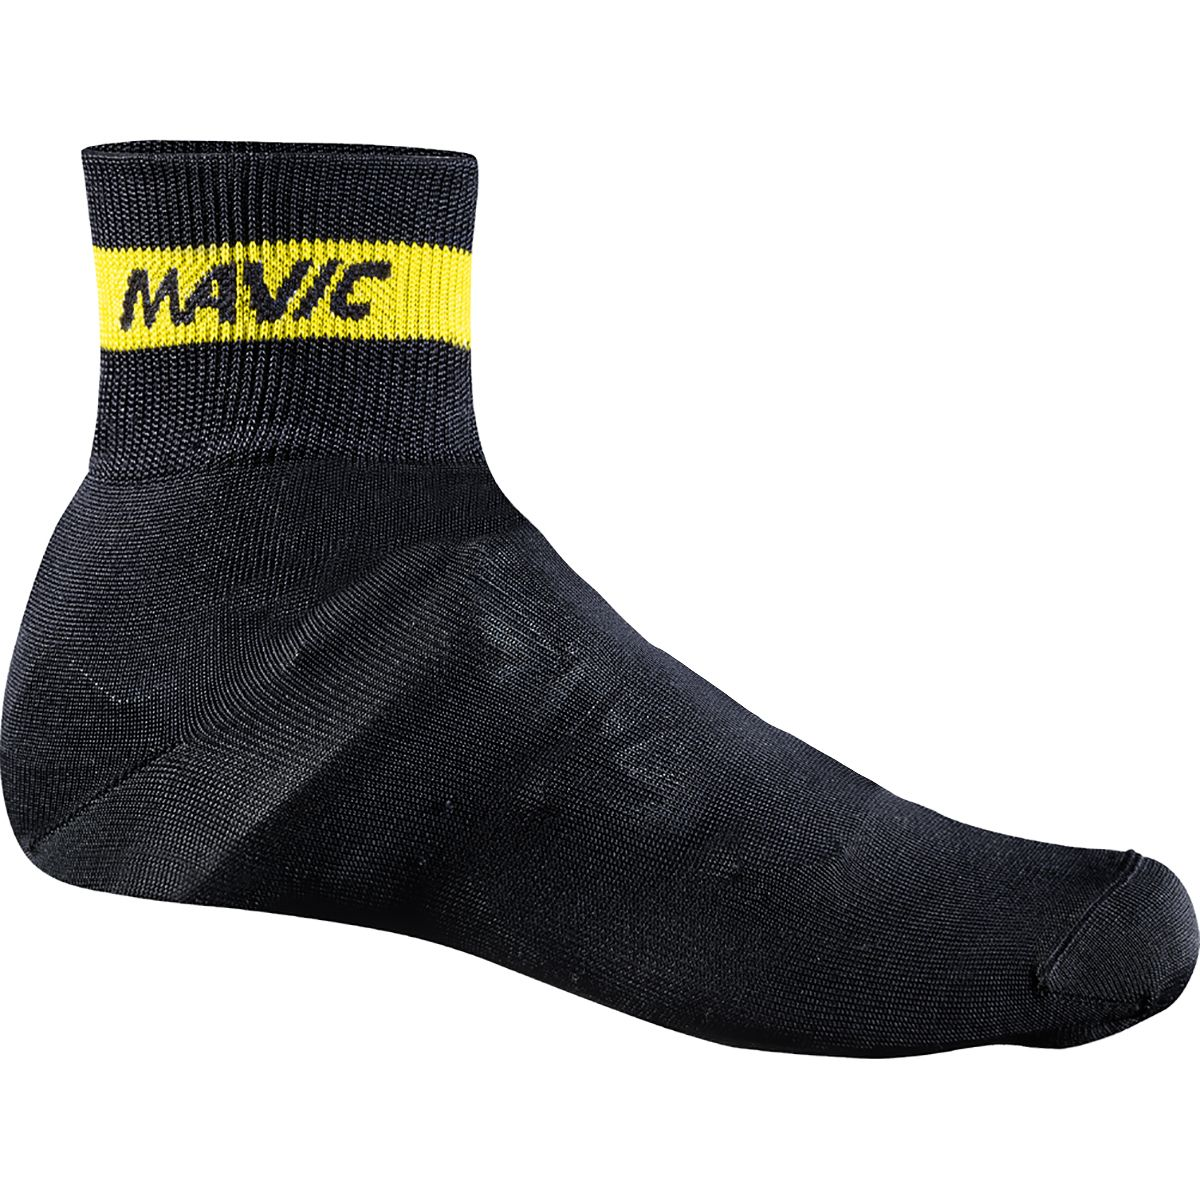 Mavic Knit Shoe Covers